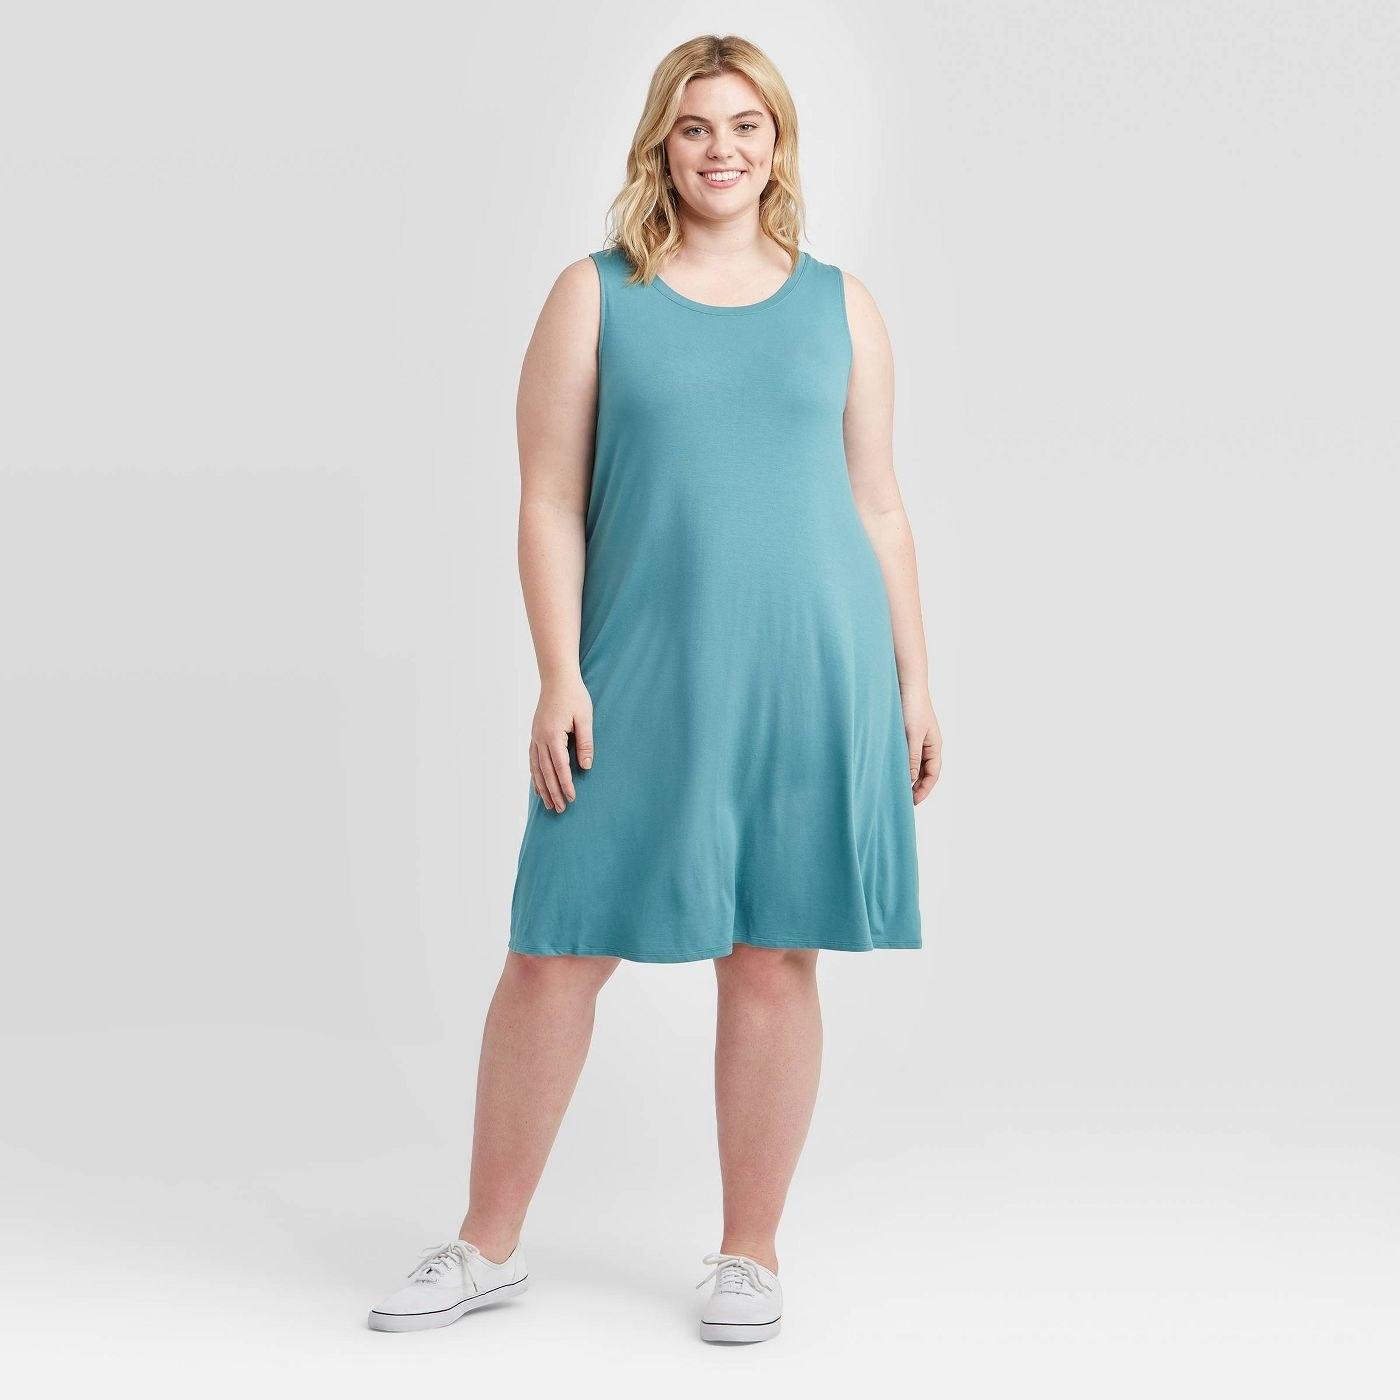 model wearing midi blue tank dress